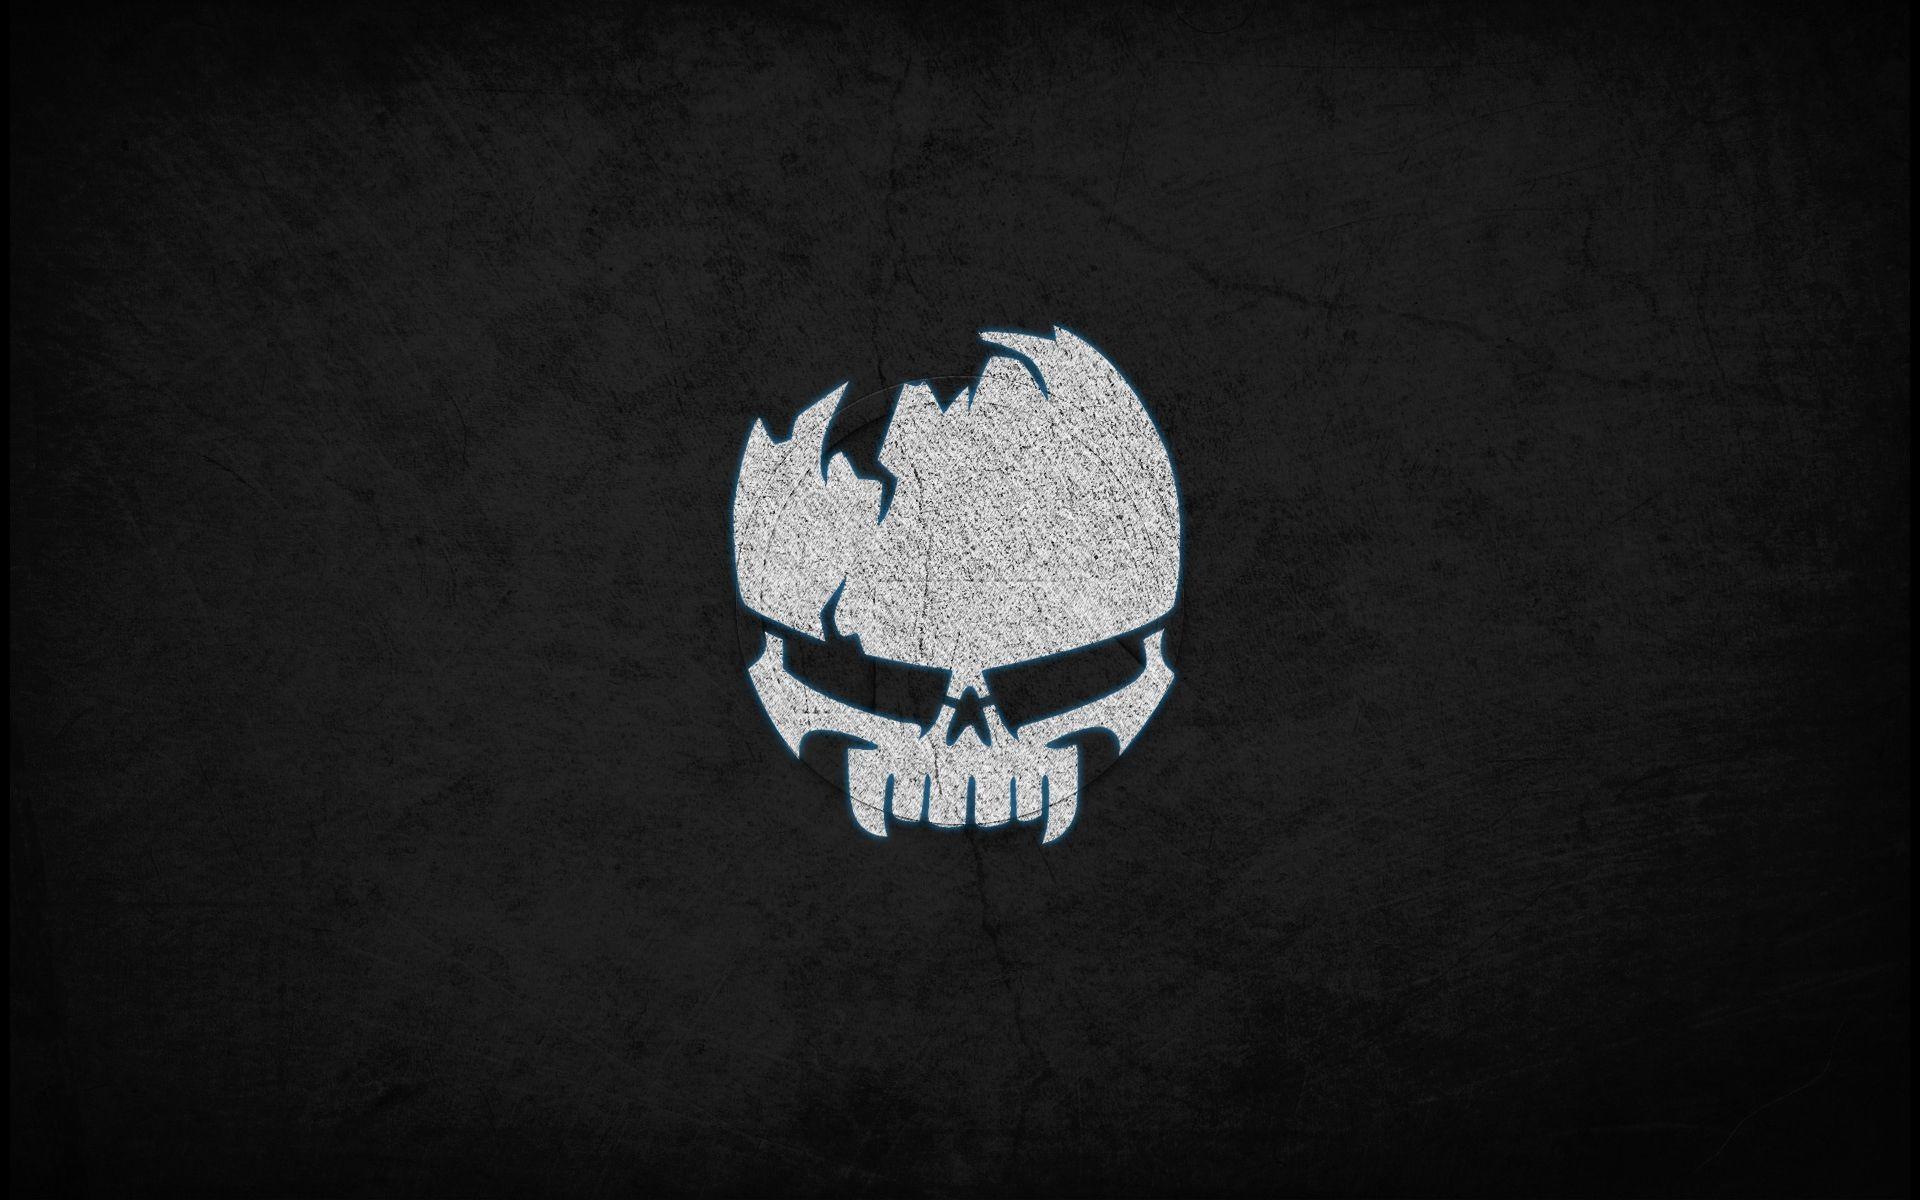 Cool Skull Wallpaper HD 1920×1200 Cool HD Skull Wallpapers (47 Wallpapers) |